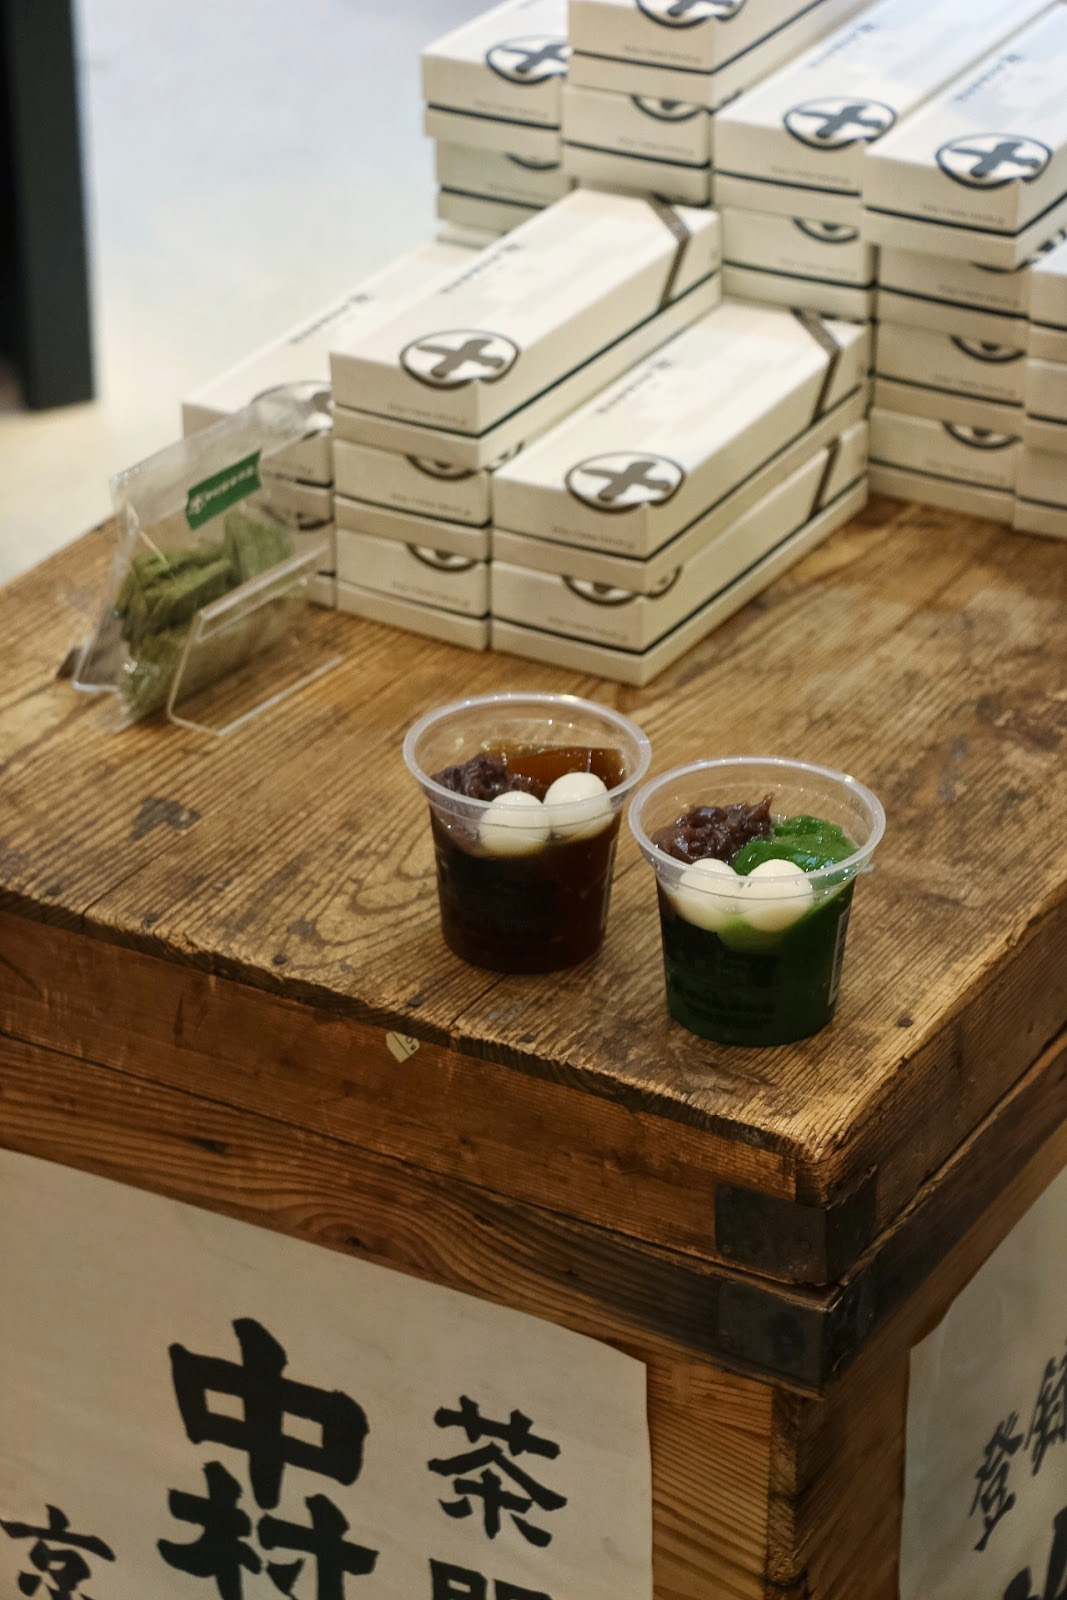 Nakamura Tokichi Pop Up, #TokichiHkatPP, Matcha Tea Jelly, Houjicha Tea Jelly